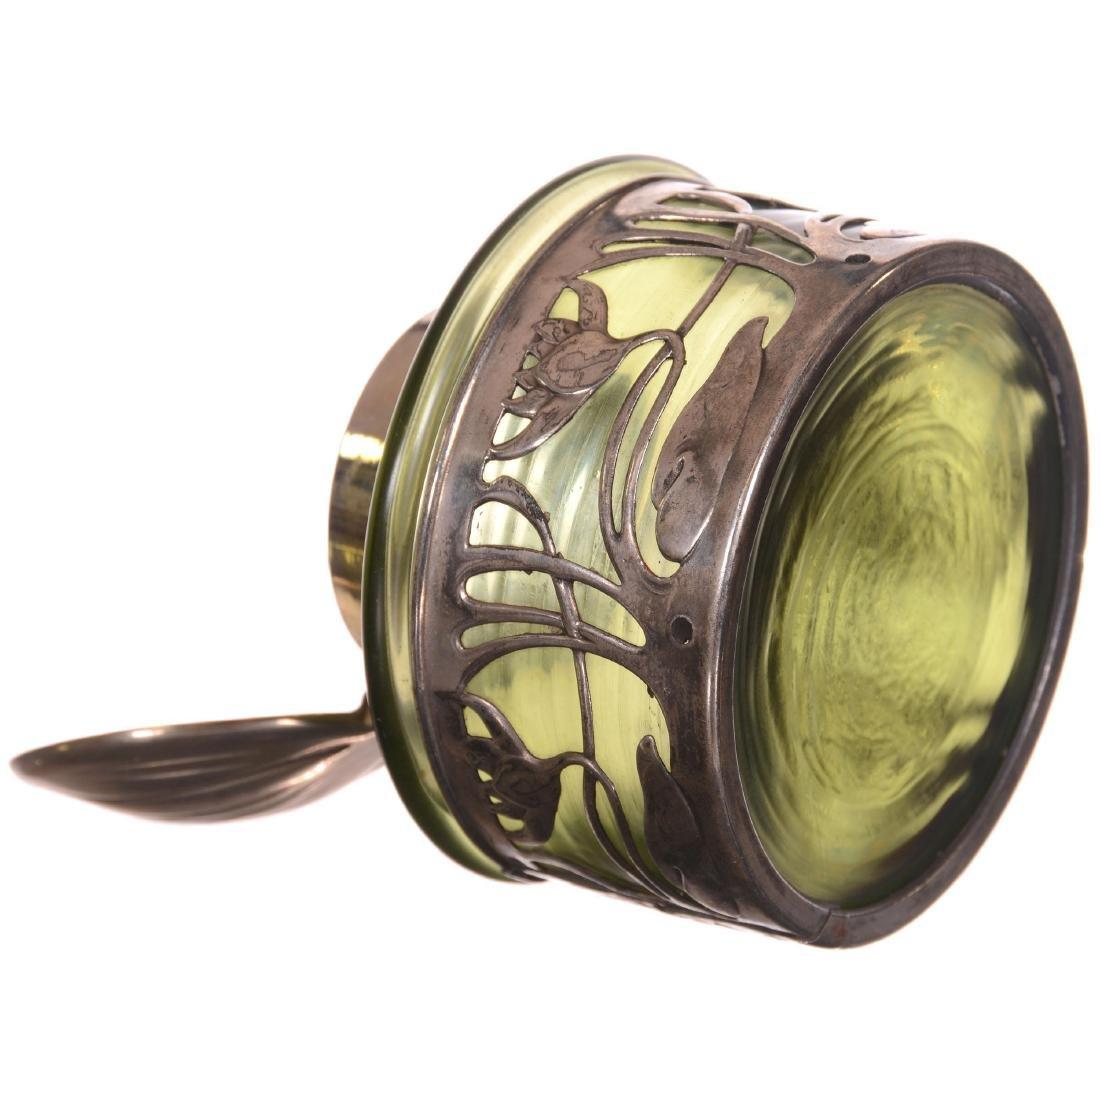 Green Iridescent Loetz Style Art Glass Inkwell - 2